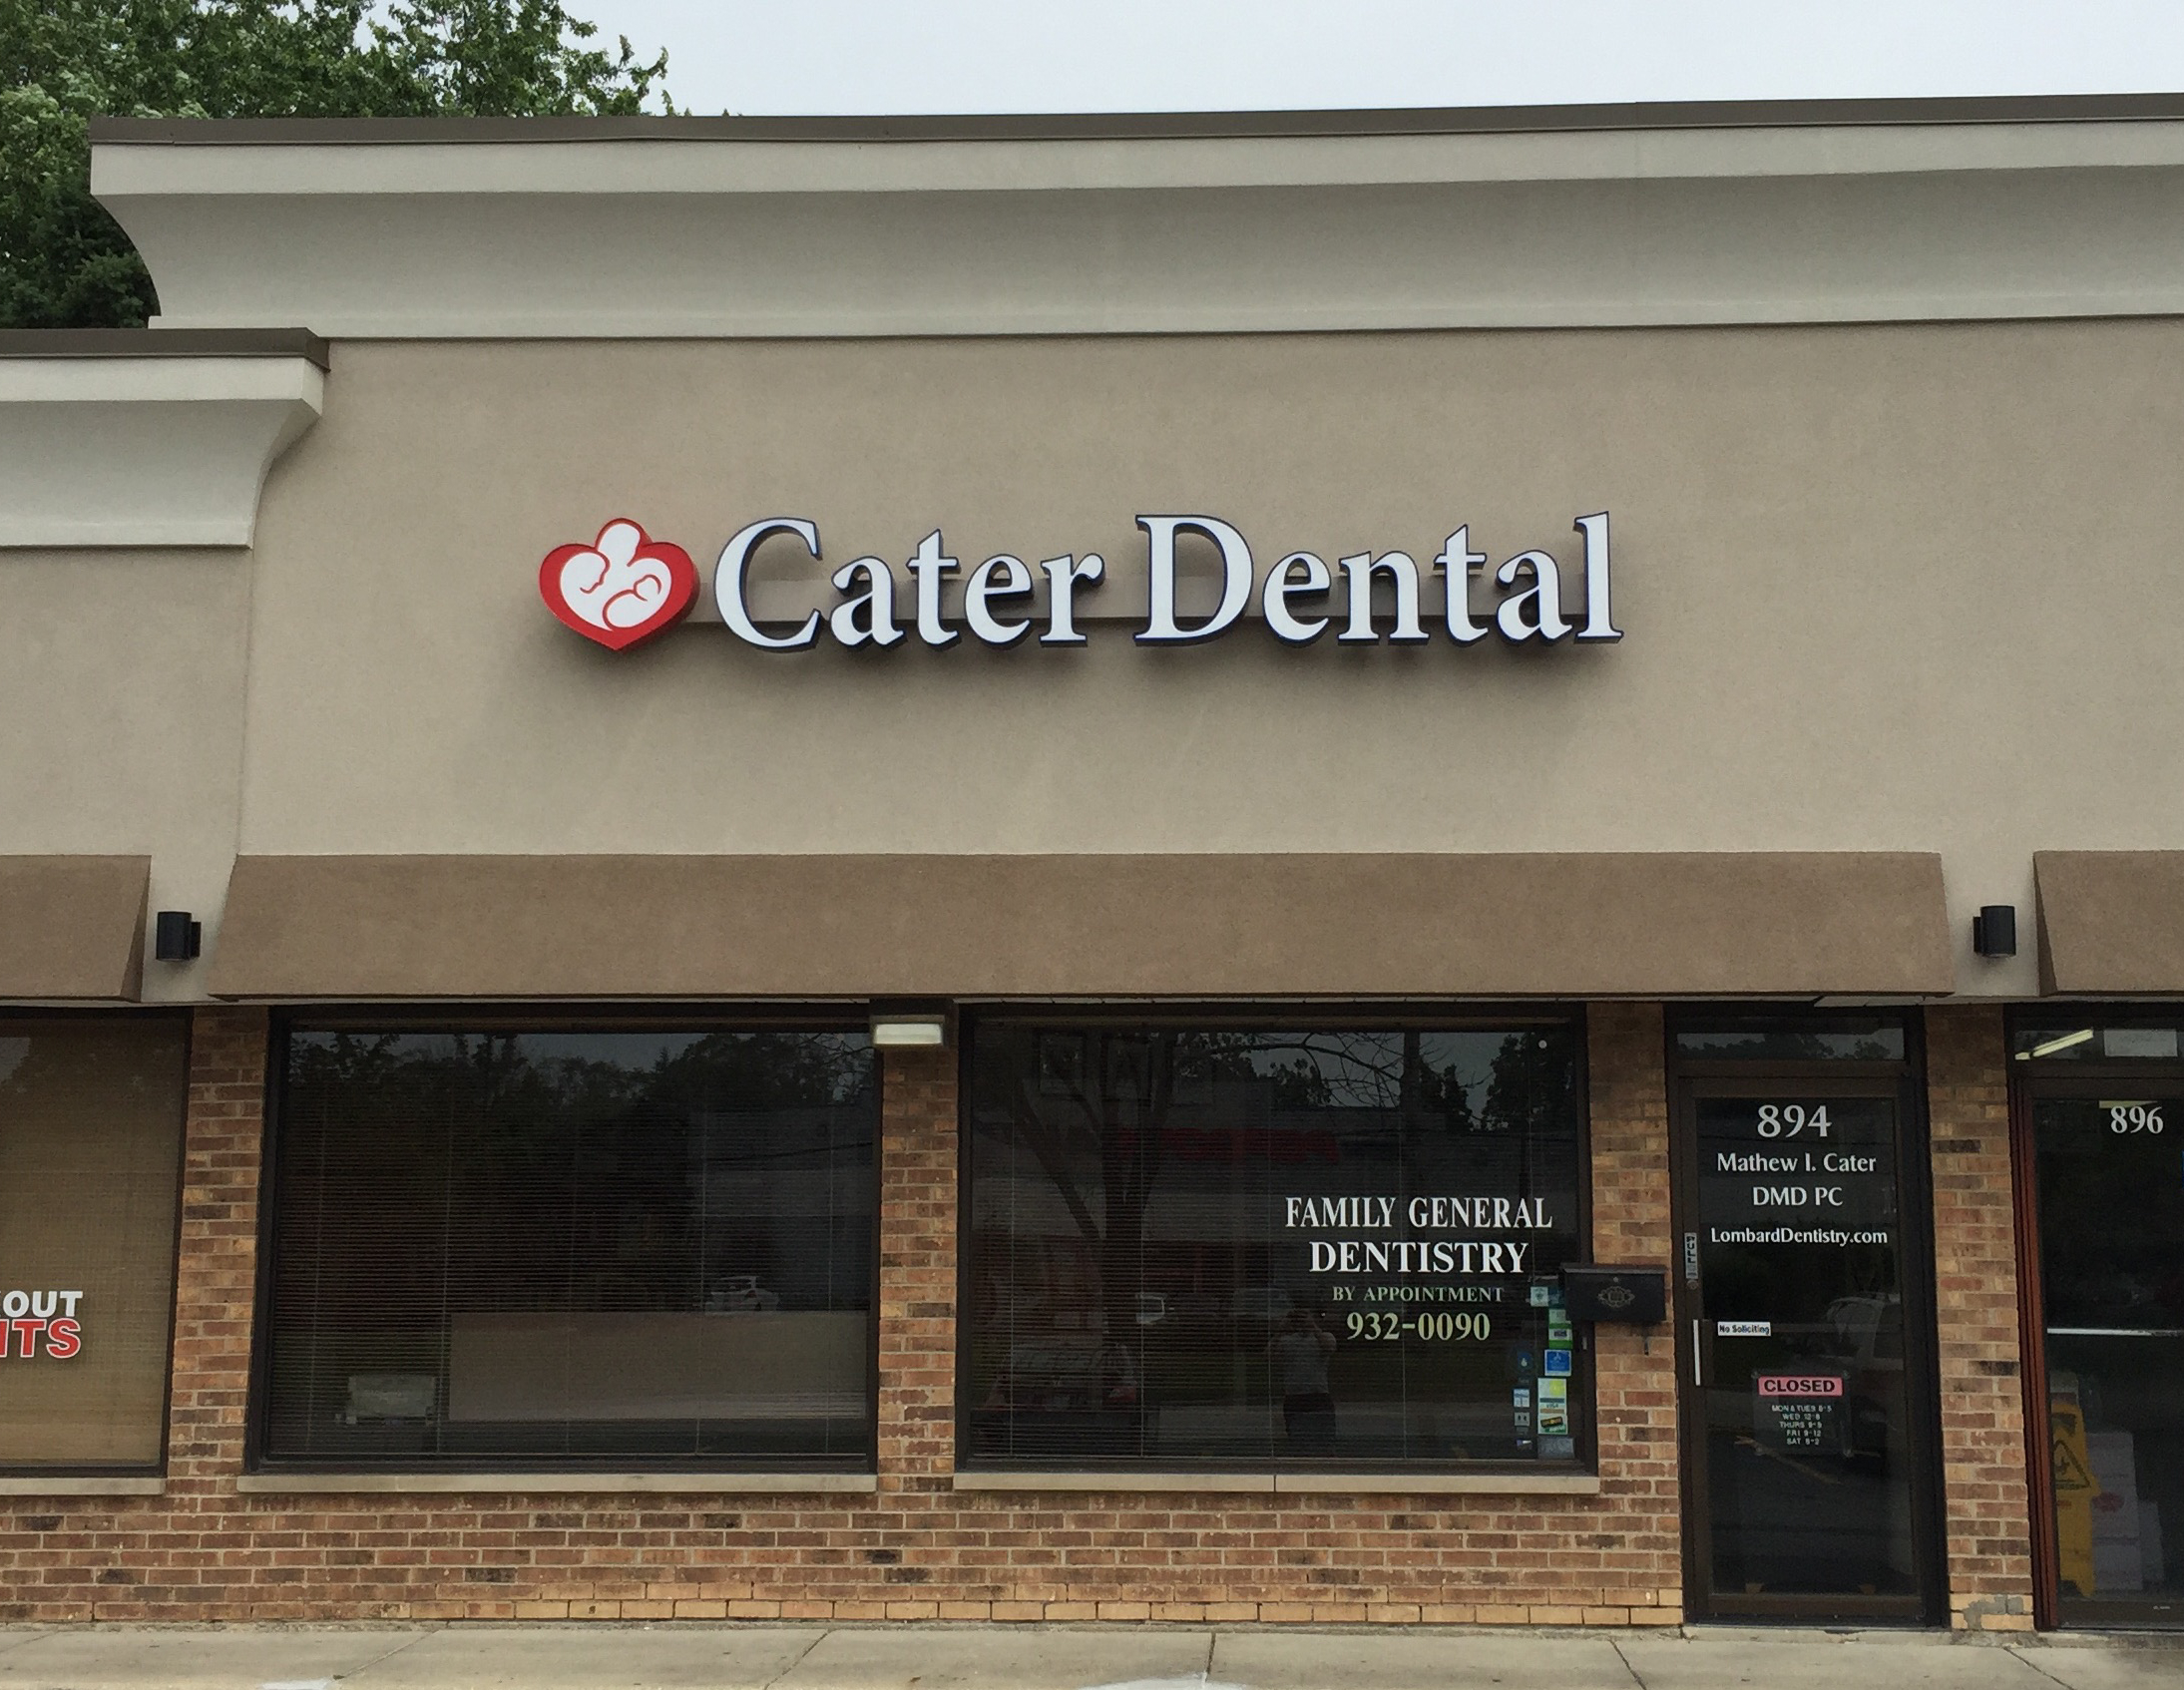 Cater Dental image 1